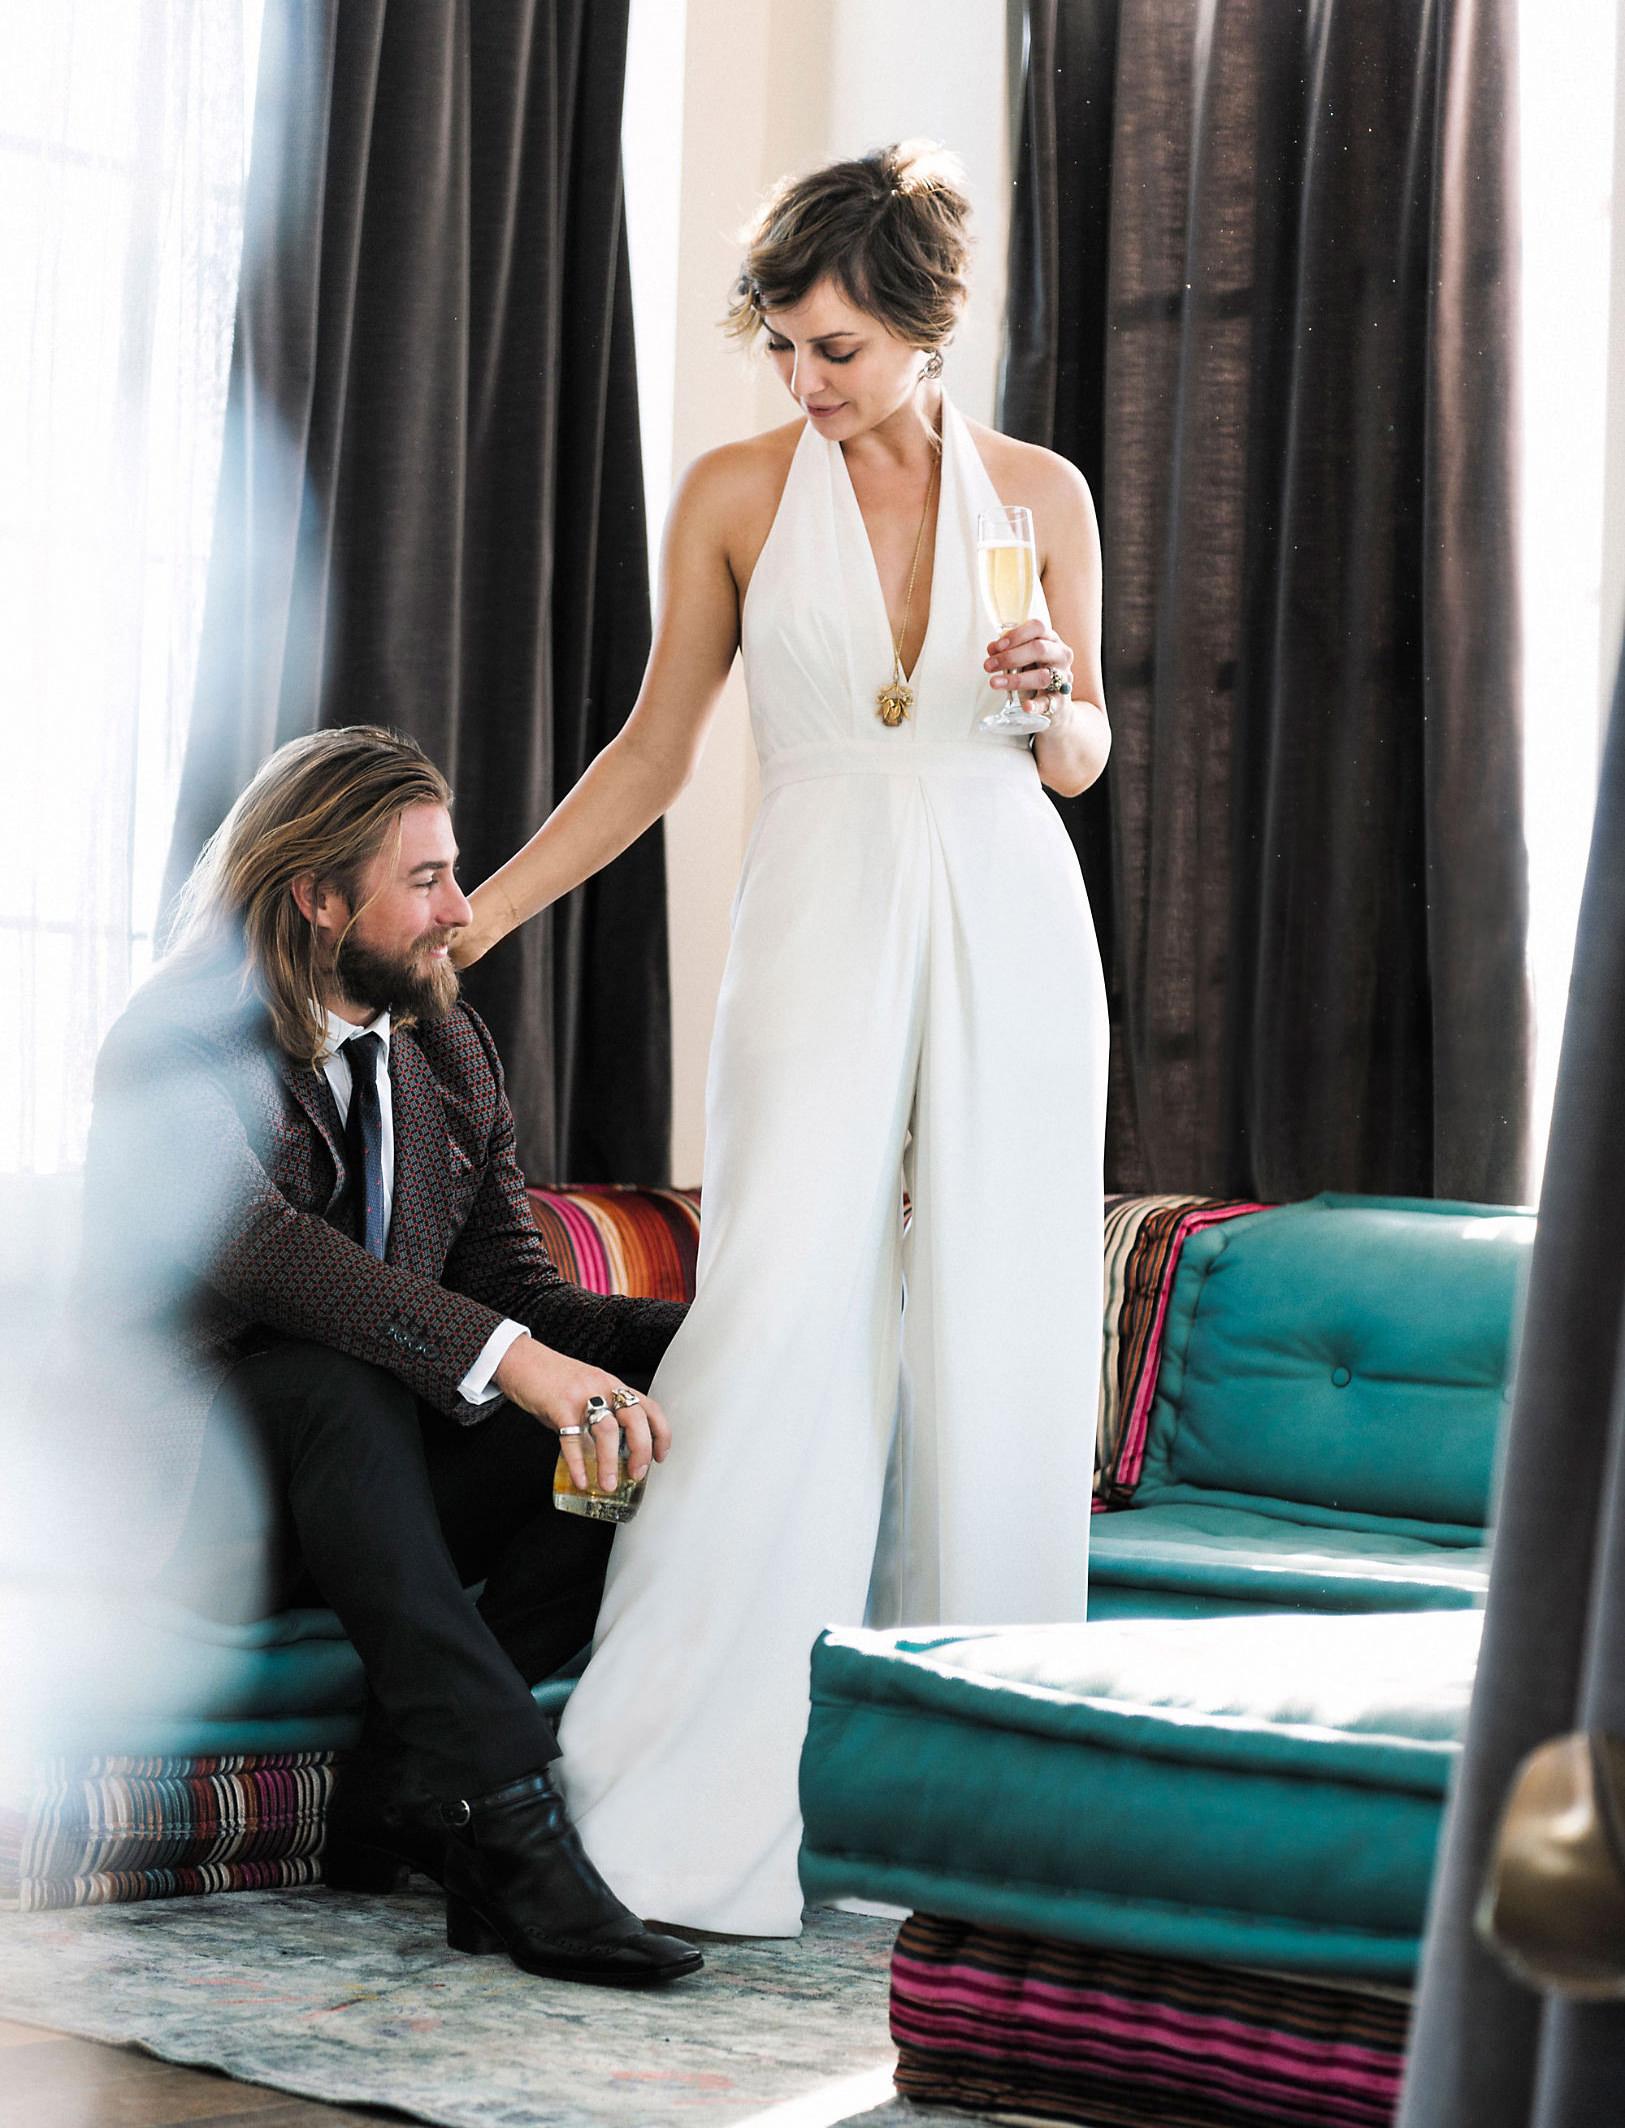 casamento-civil-noiva-de-macacao-branco